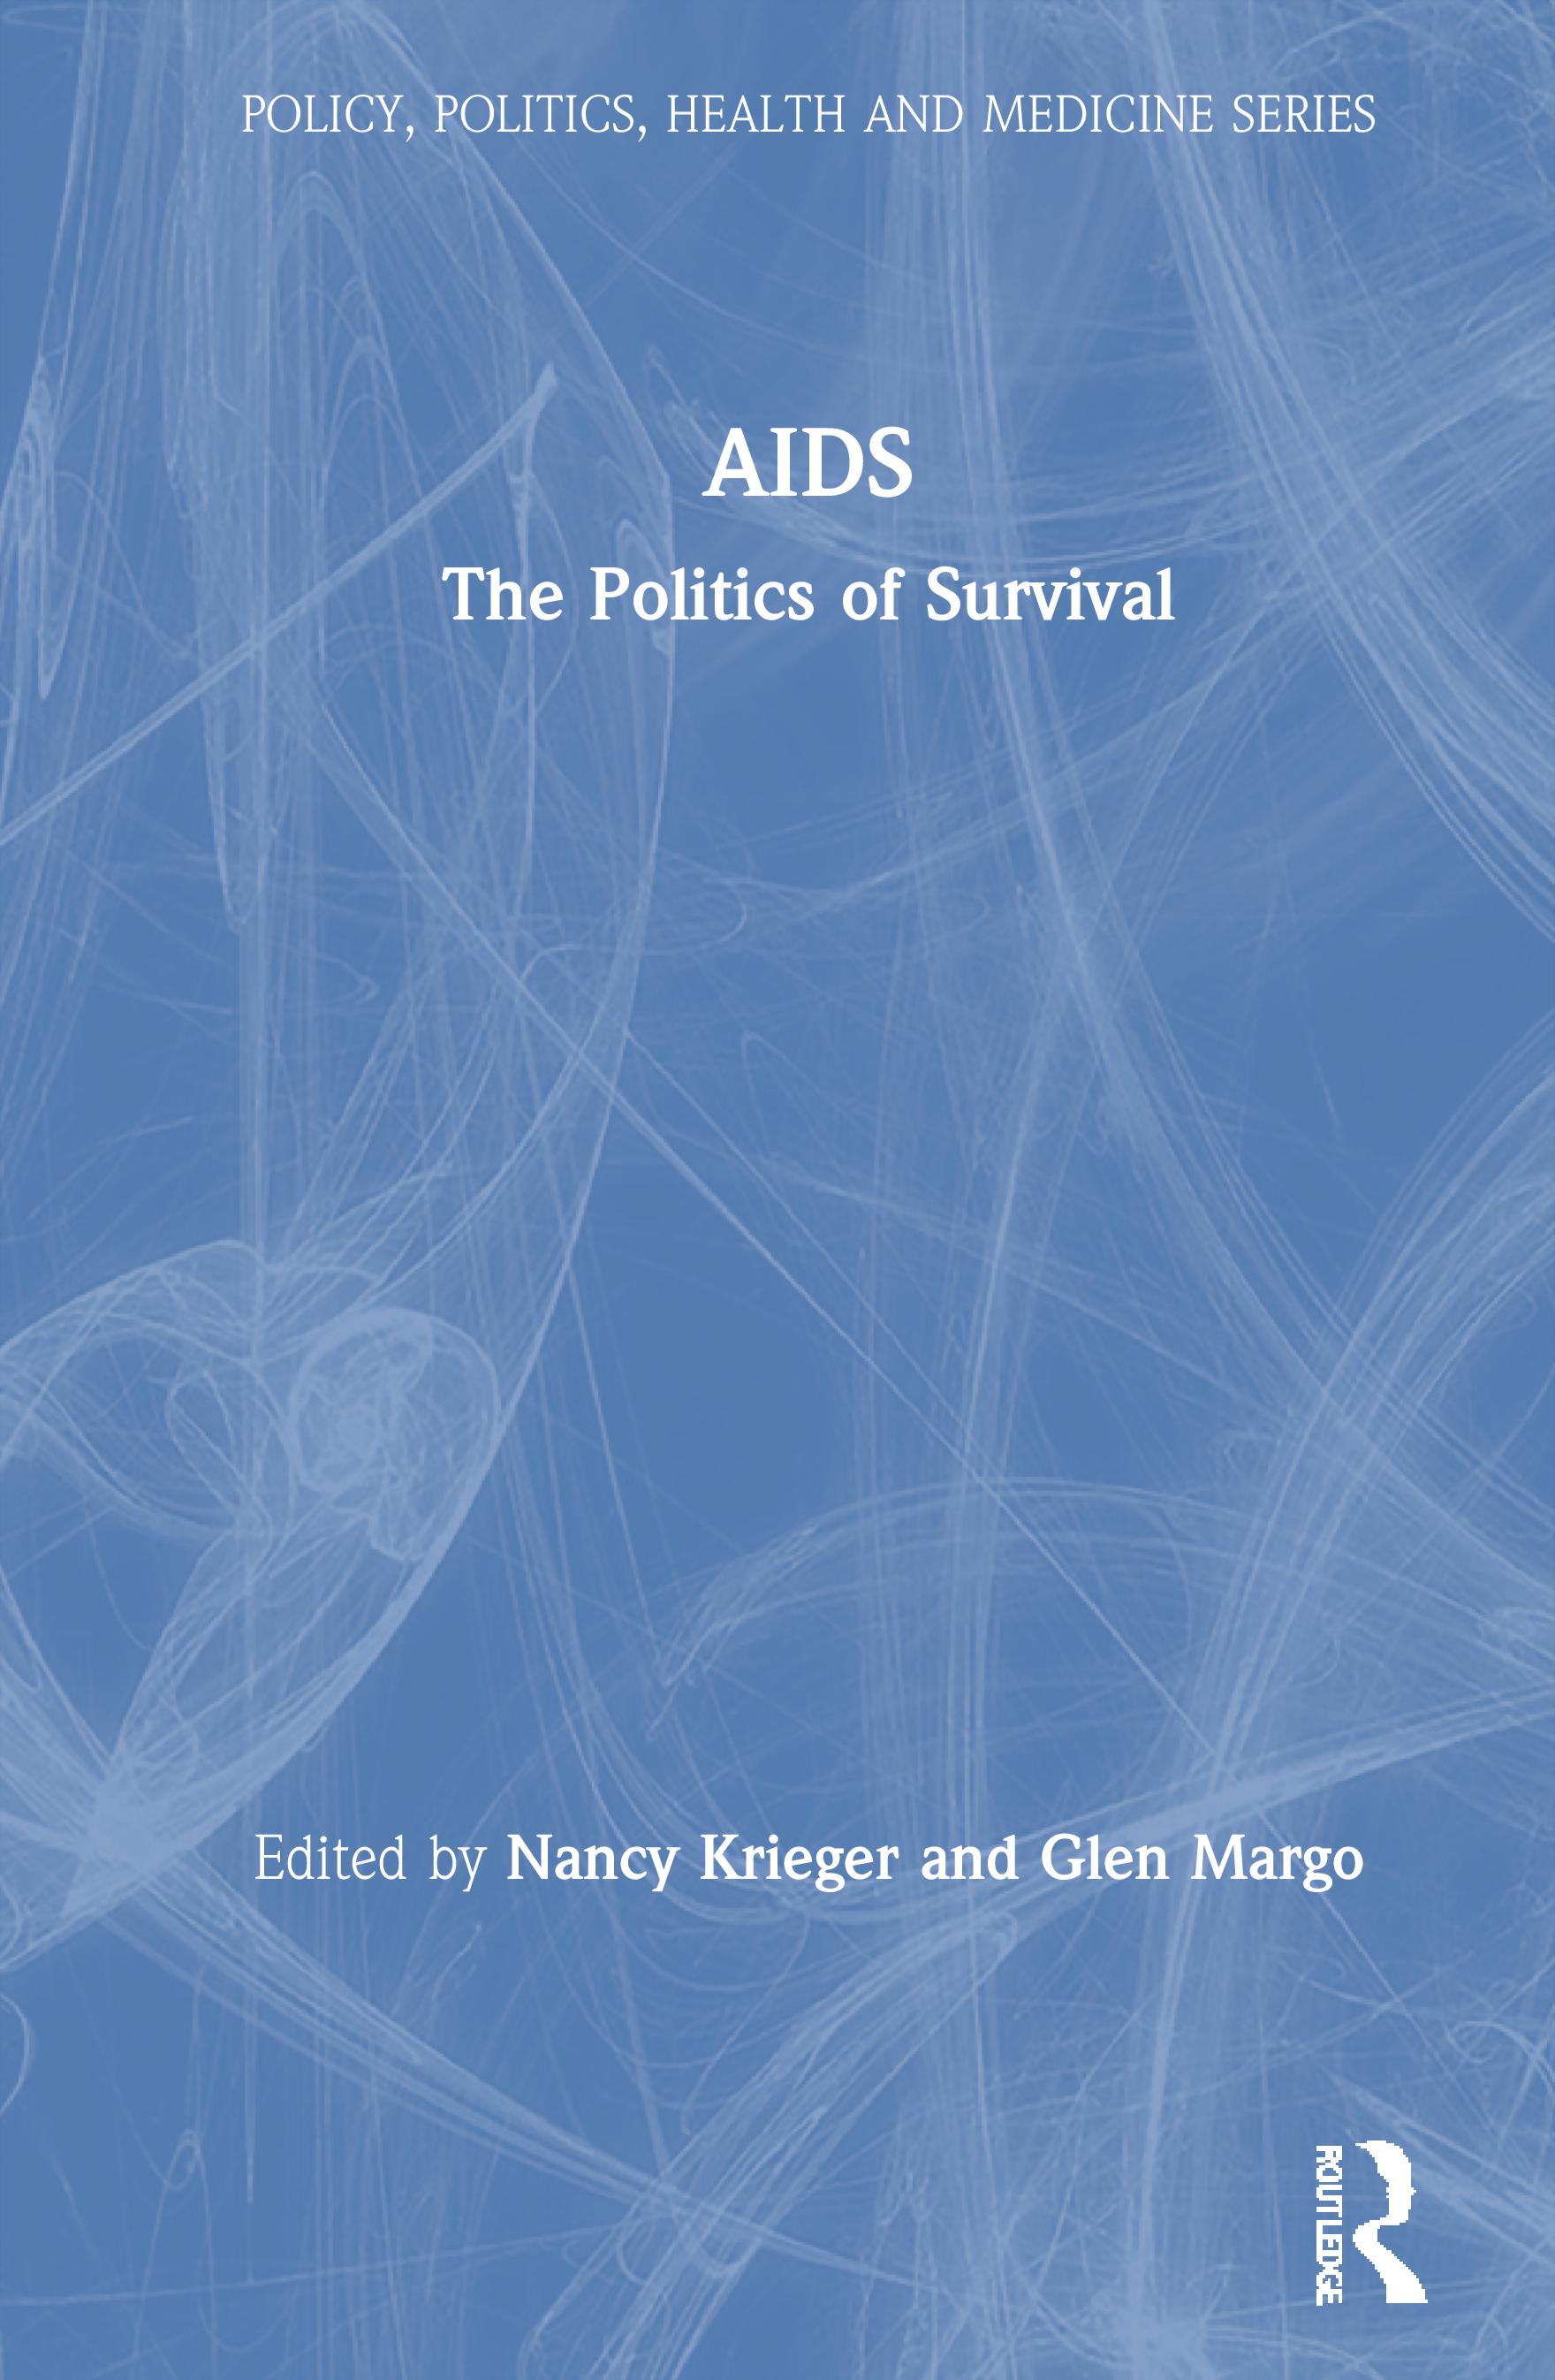 AIDS: The Politics of Survival